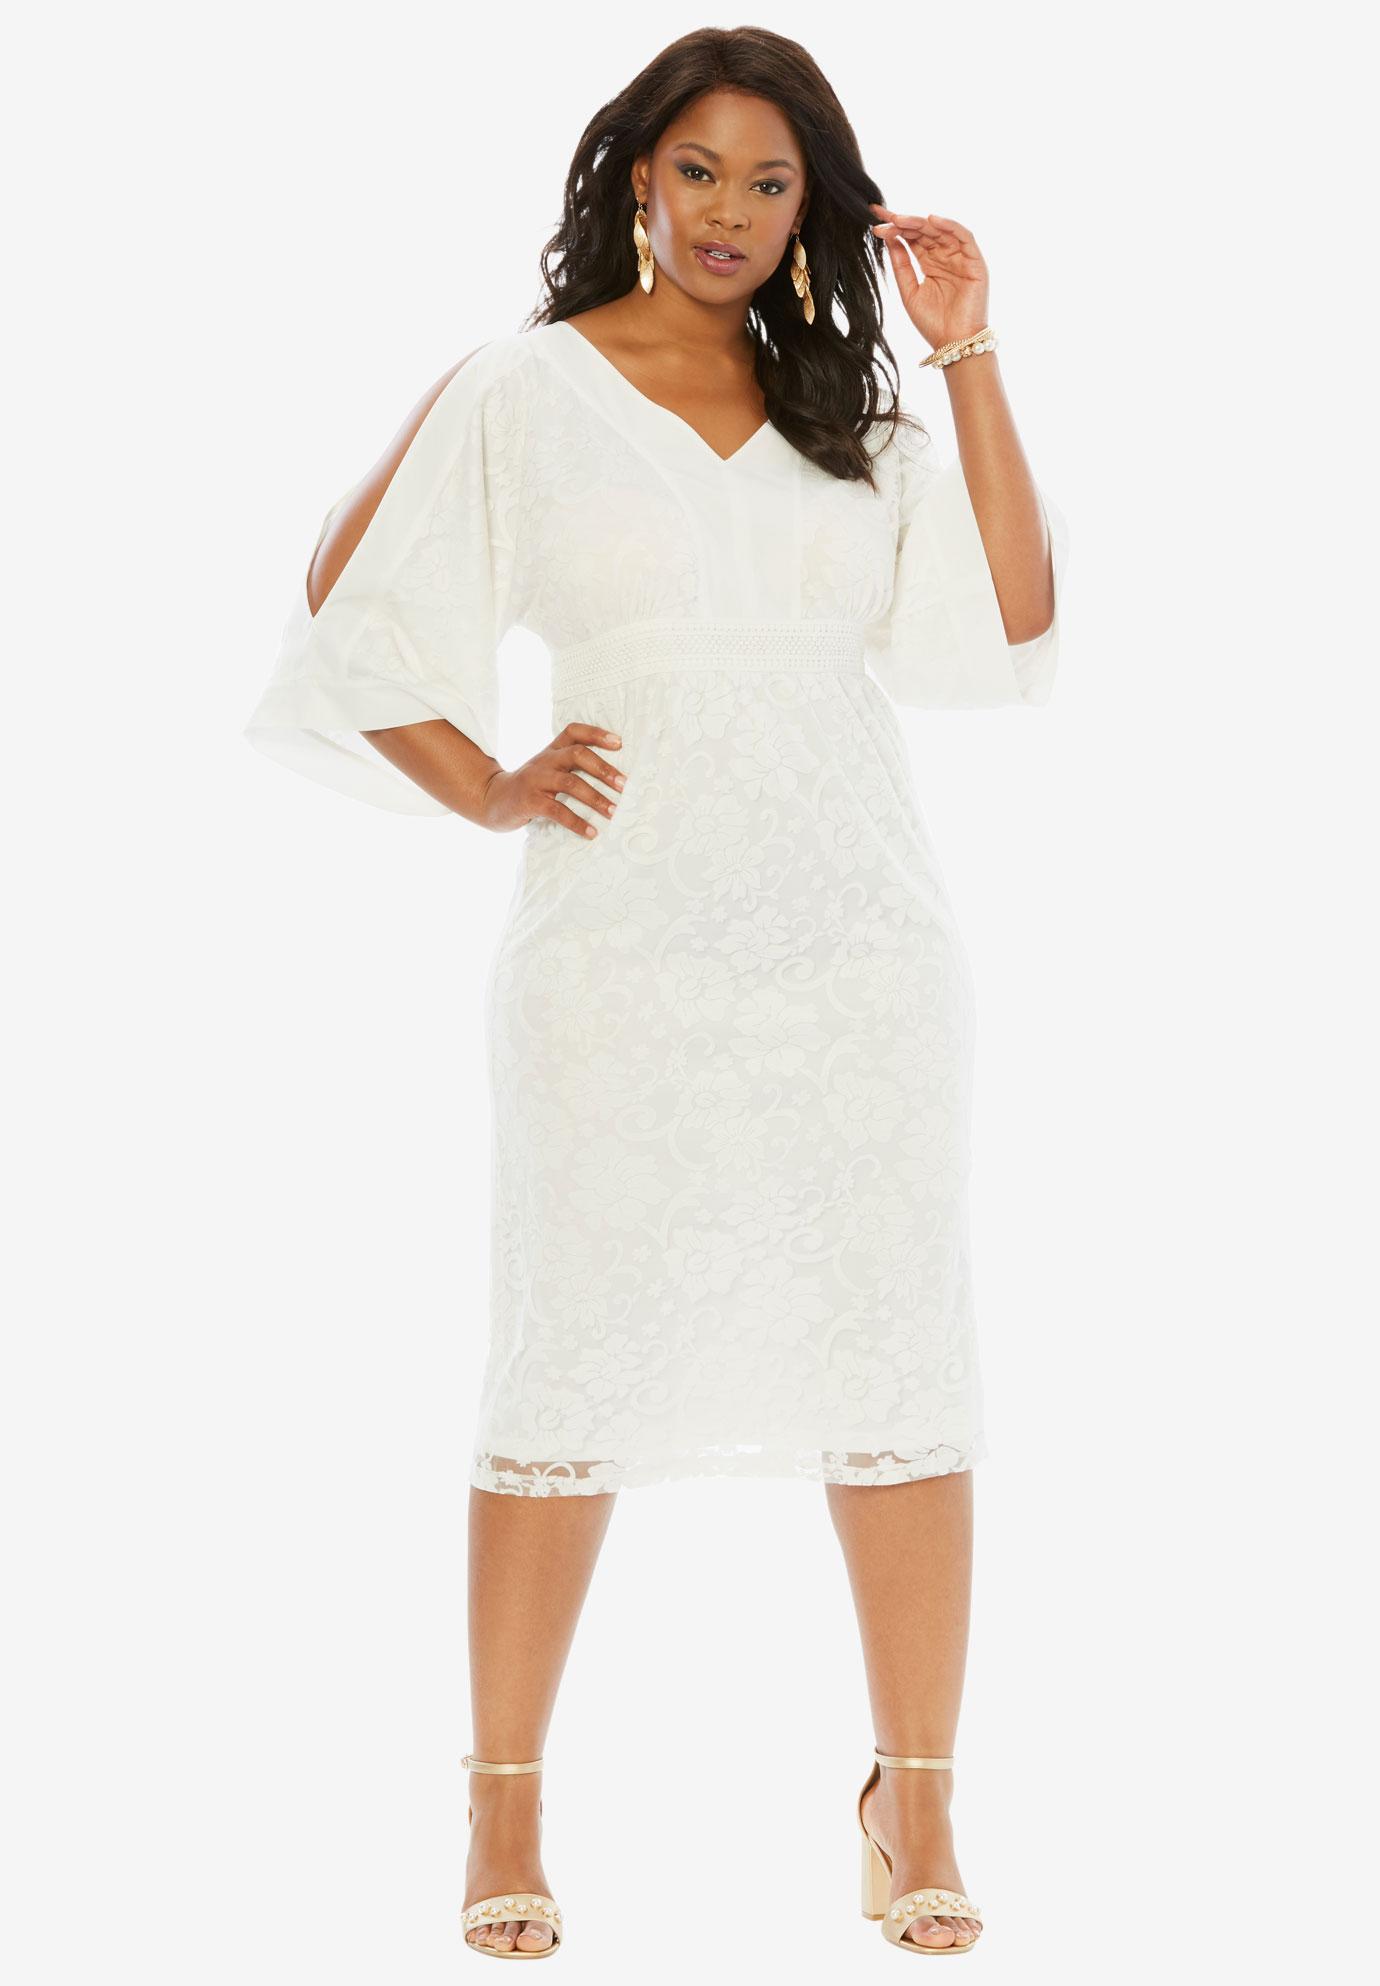 Fullsize Of Plus Size Cocktail Dresses